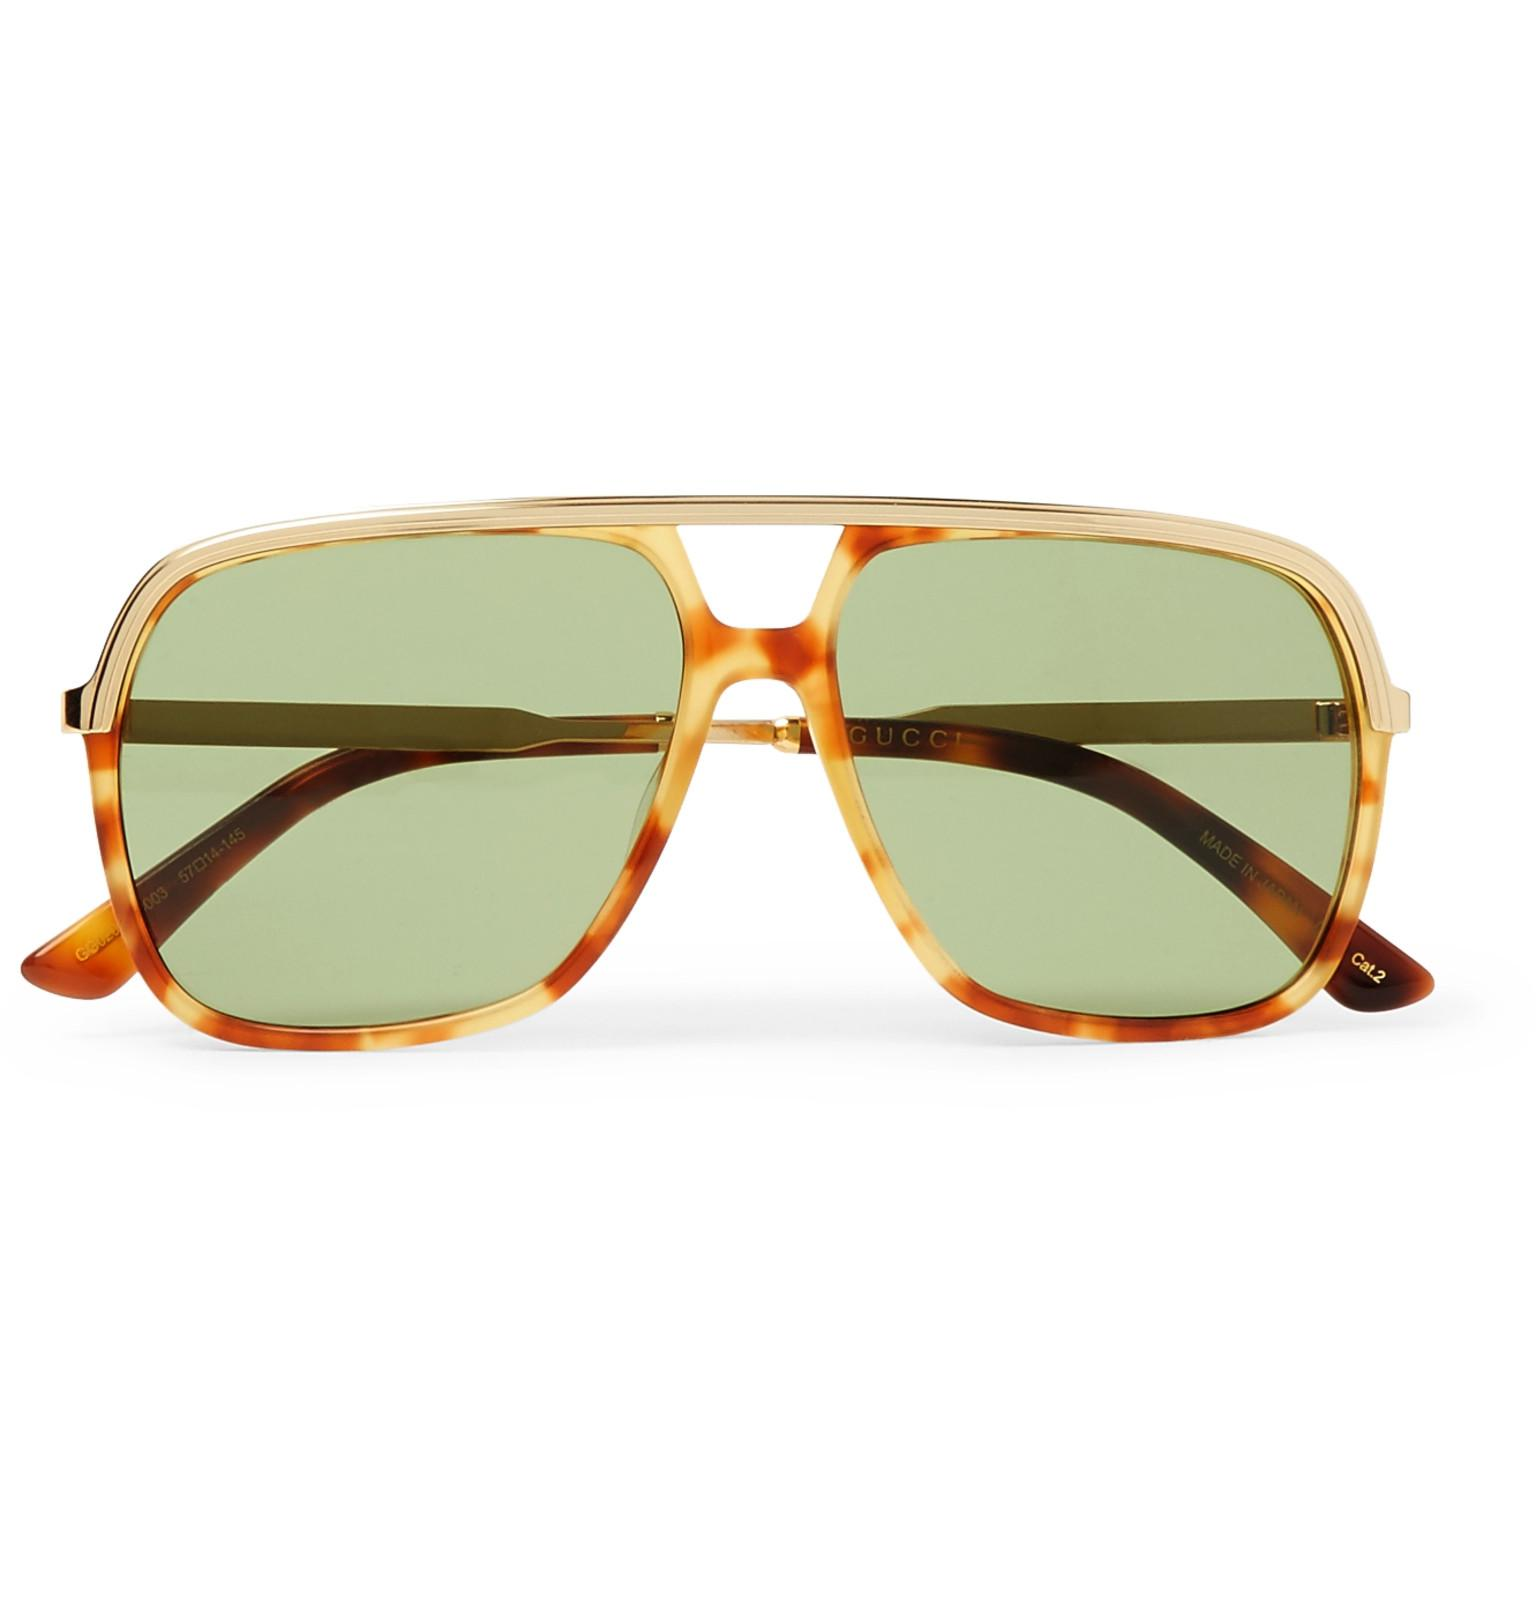 3dd514374a55 Gucci Aviator-style Tortoiseshell Acetate And Gold-tone Sunglasses ...